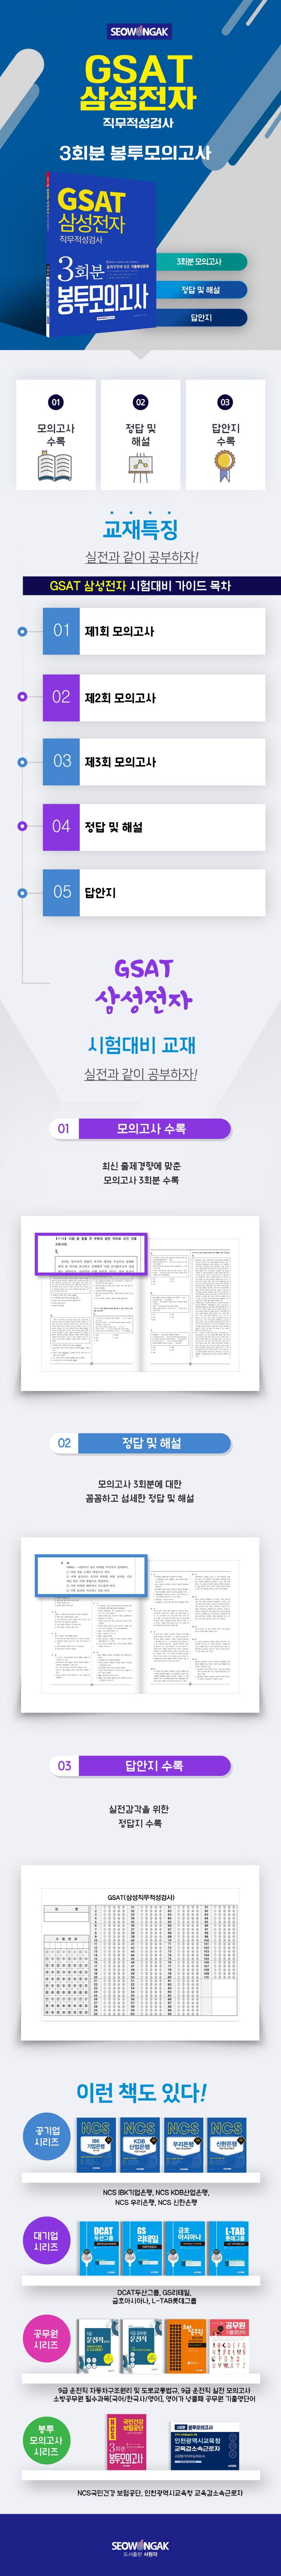 GSAT 삼성전자 직무적성검사 봉투모의고사(3회분)(2019 하반기) 도서 상세이미지